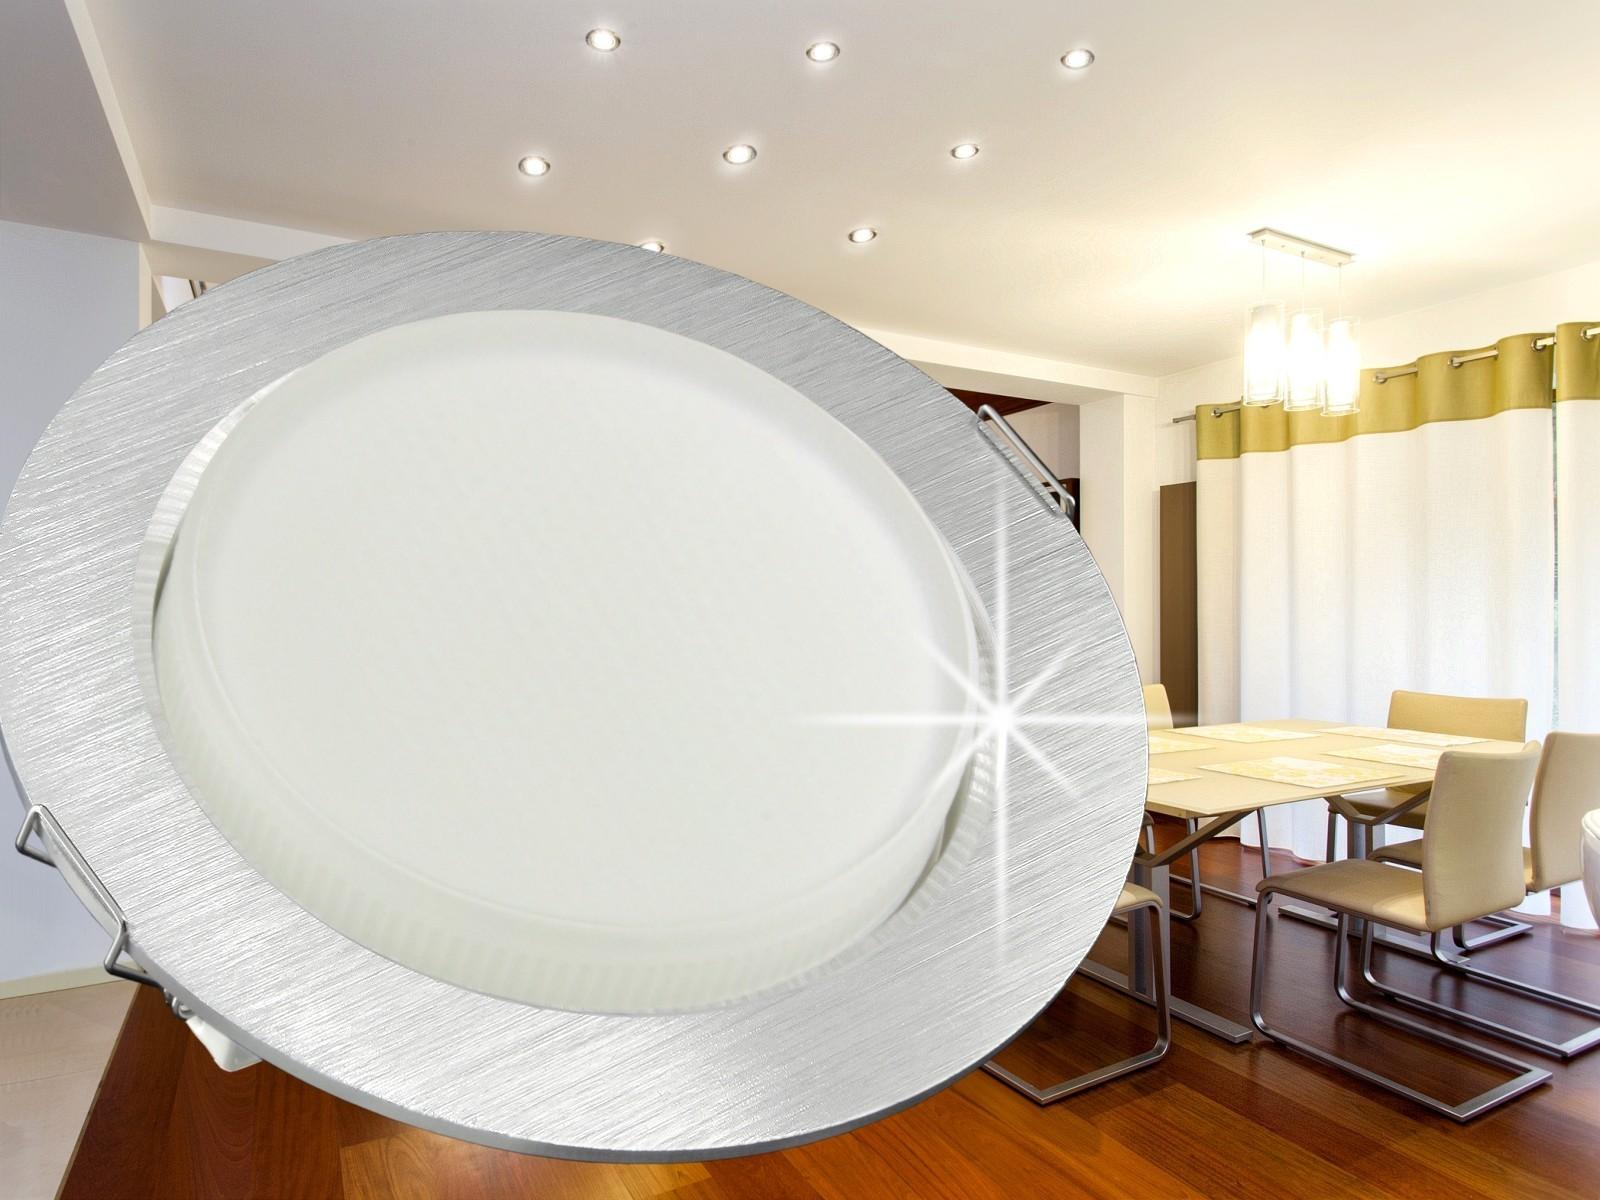 rx 3 alu led einbauleuchte einbaustrahler flach gx53 fassung 5 5w 230v 30 smd leds licht warm. Black Bedroom Furniture Sets. Home Design Ideas